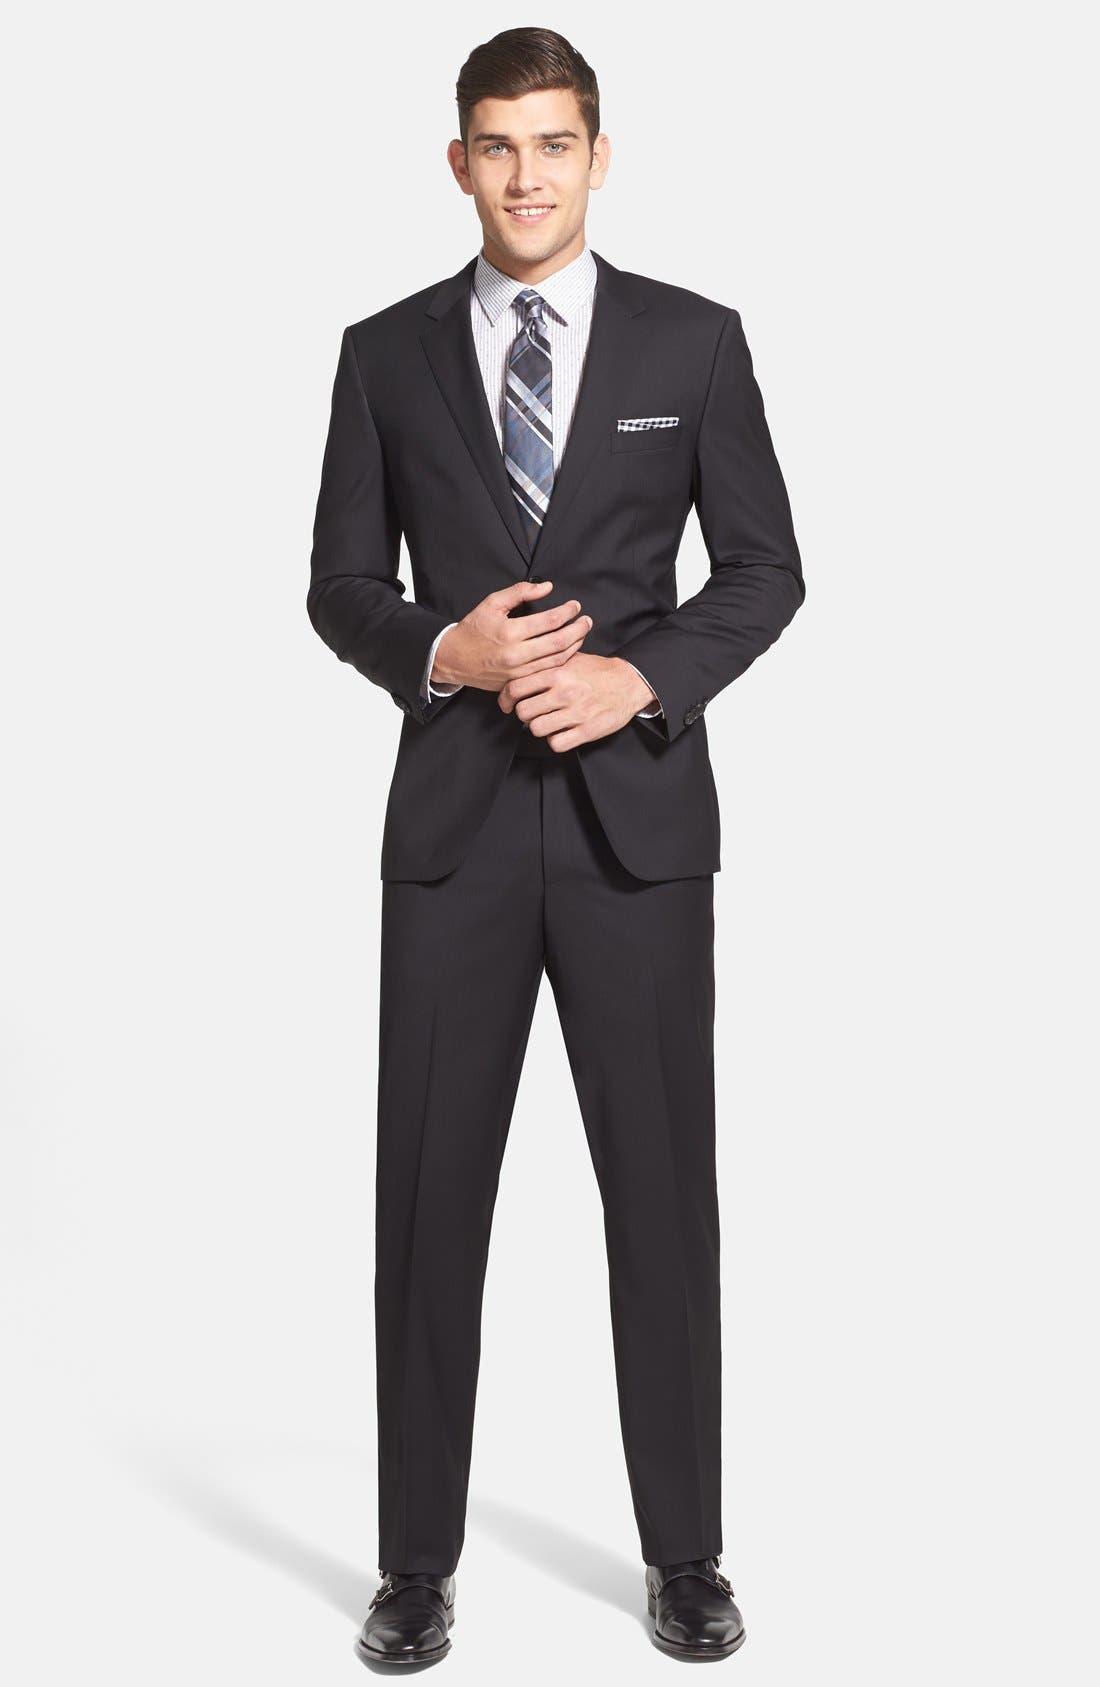 boss \u0027james sharp\u0027 trim fit black super 120s wool suit1418460 Hugo Boss Tuxedo Shirt Nordstrom #19